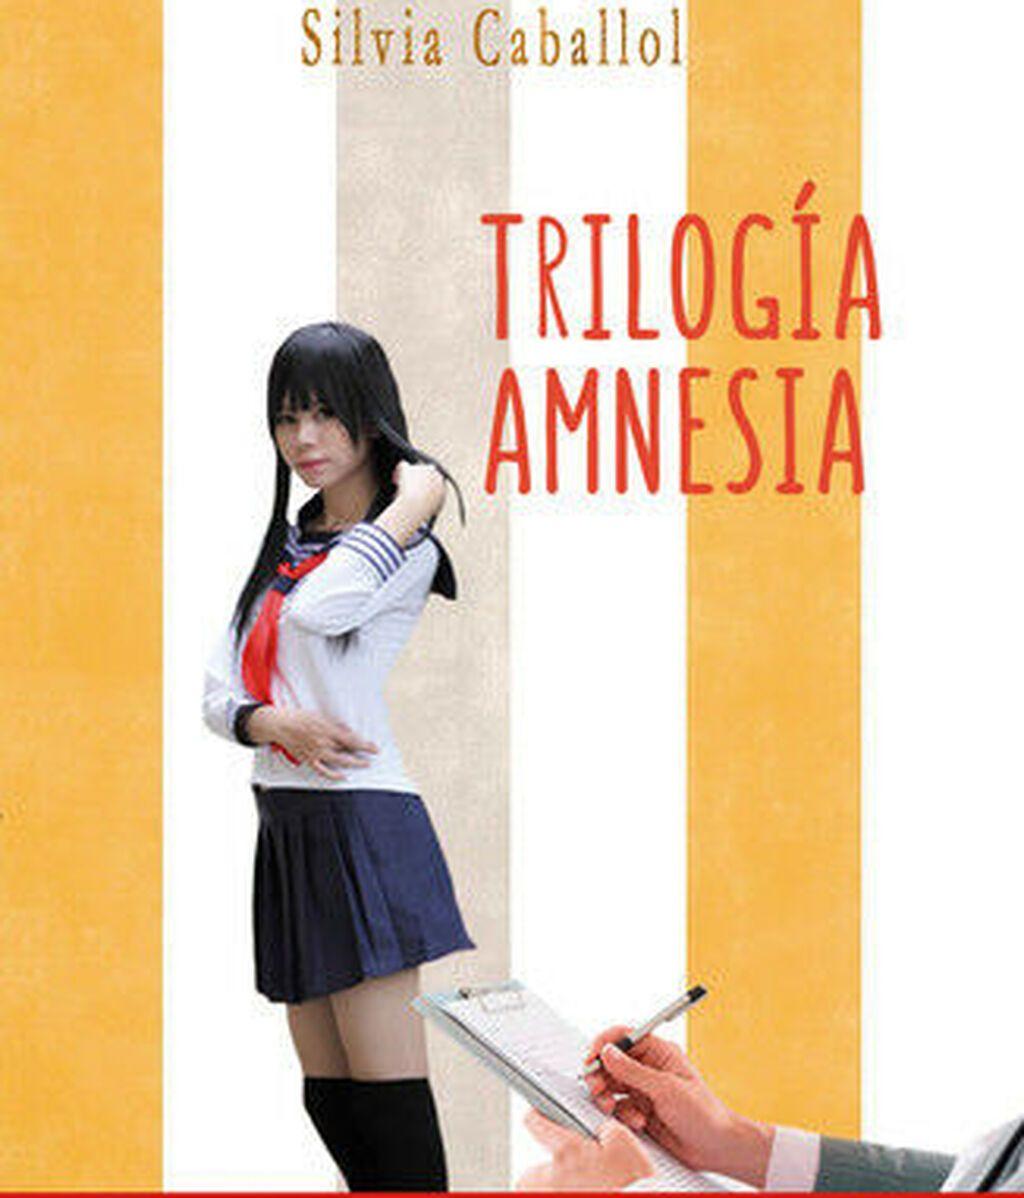 Trilogía amnesia (Silvia Caballol)